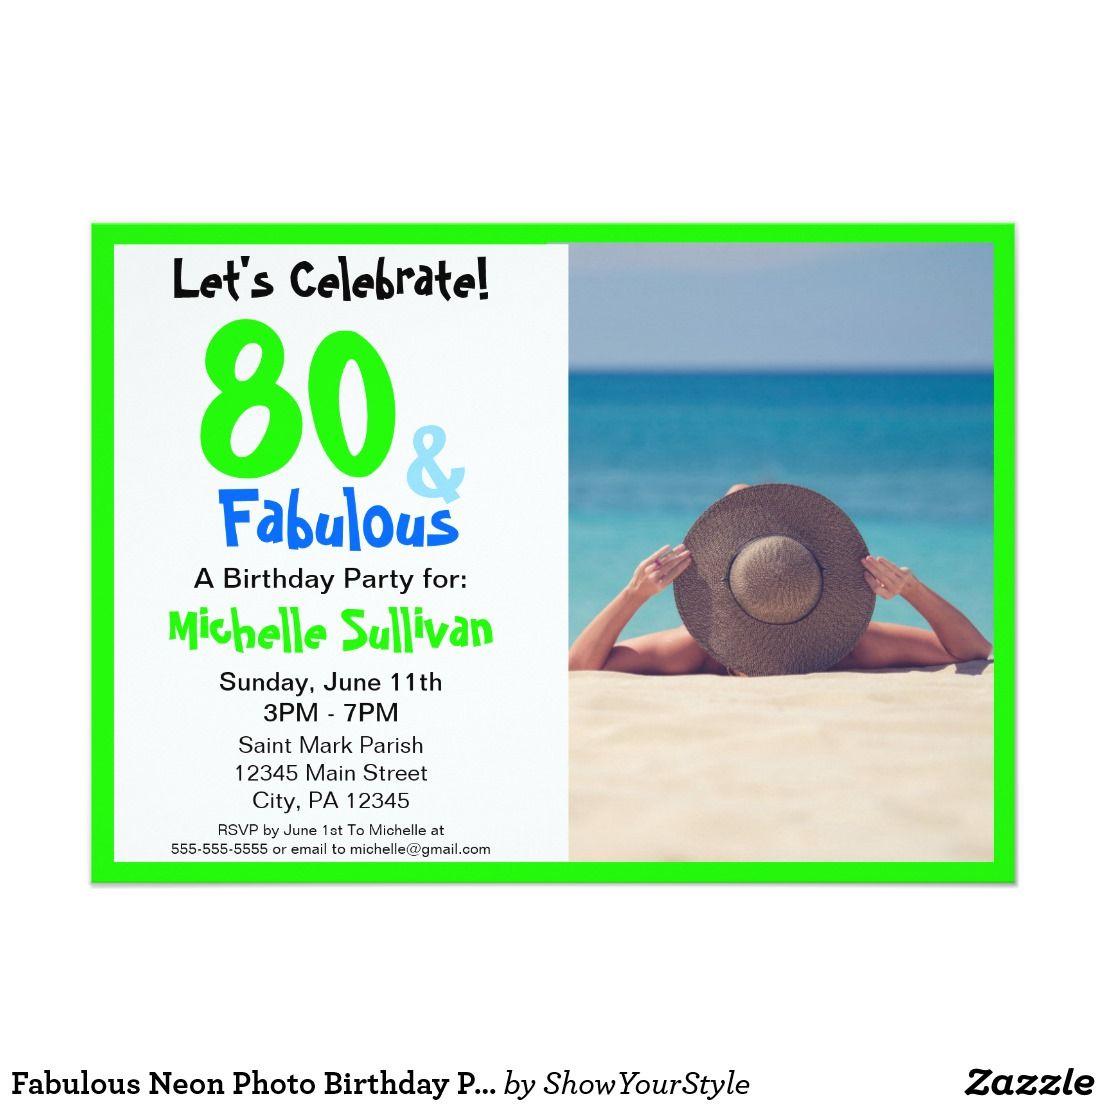 Fabulous Neon Photo Birthday Party Invitation | Pinterest | Party ...